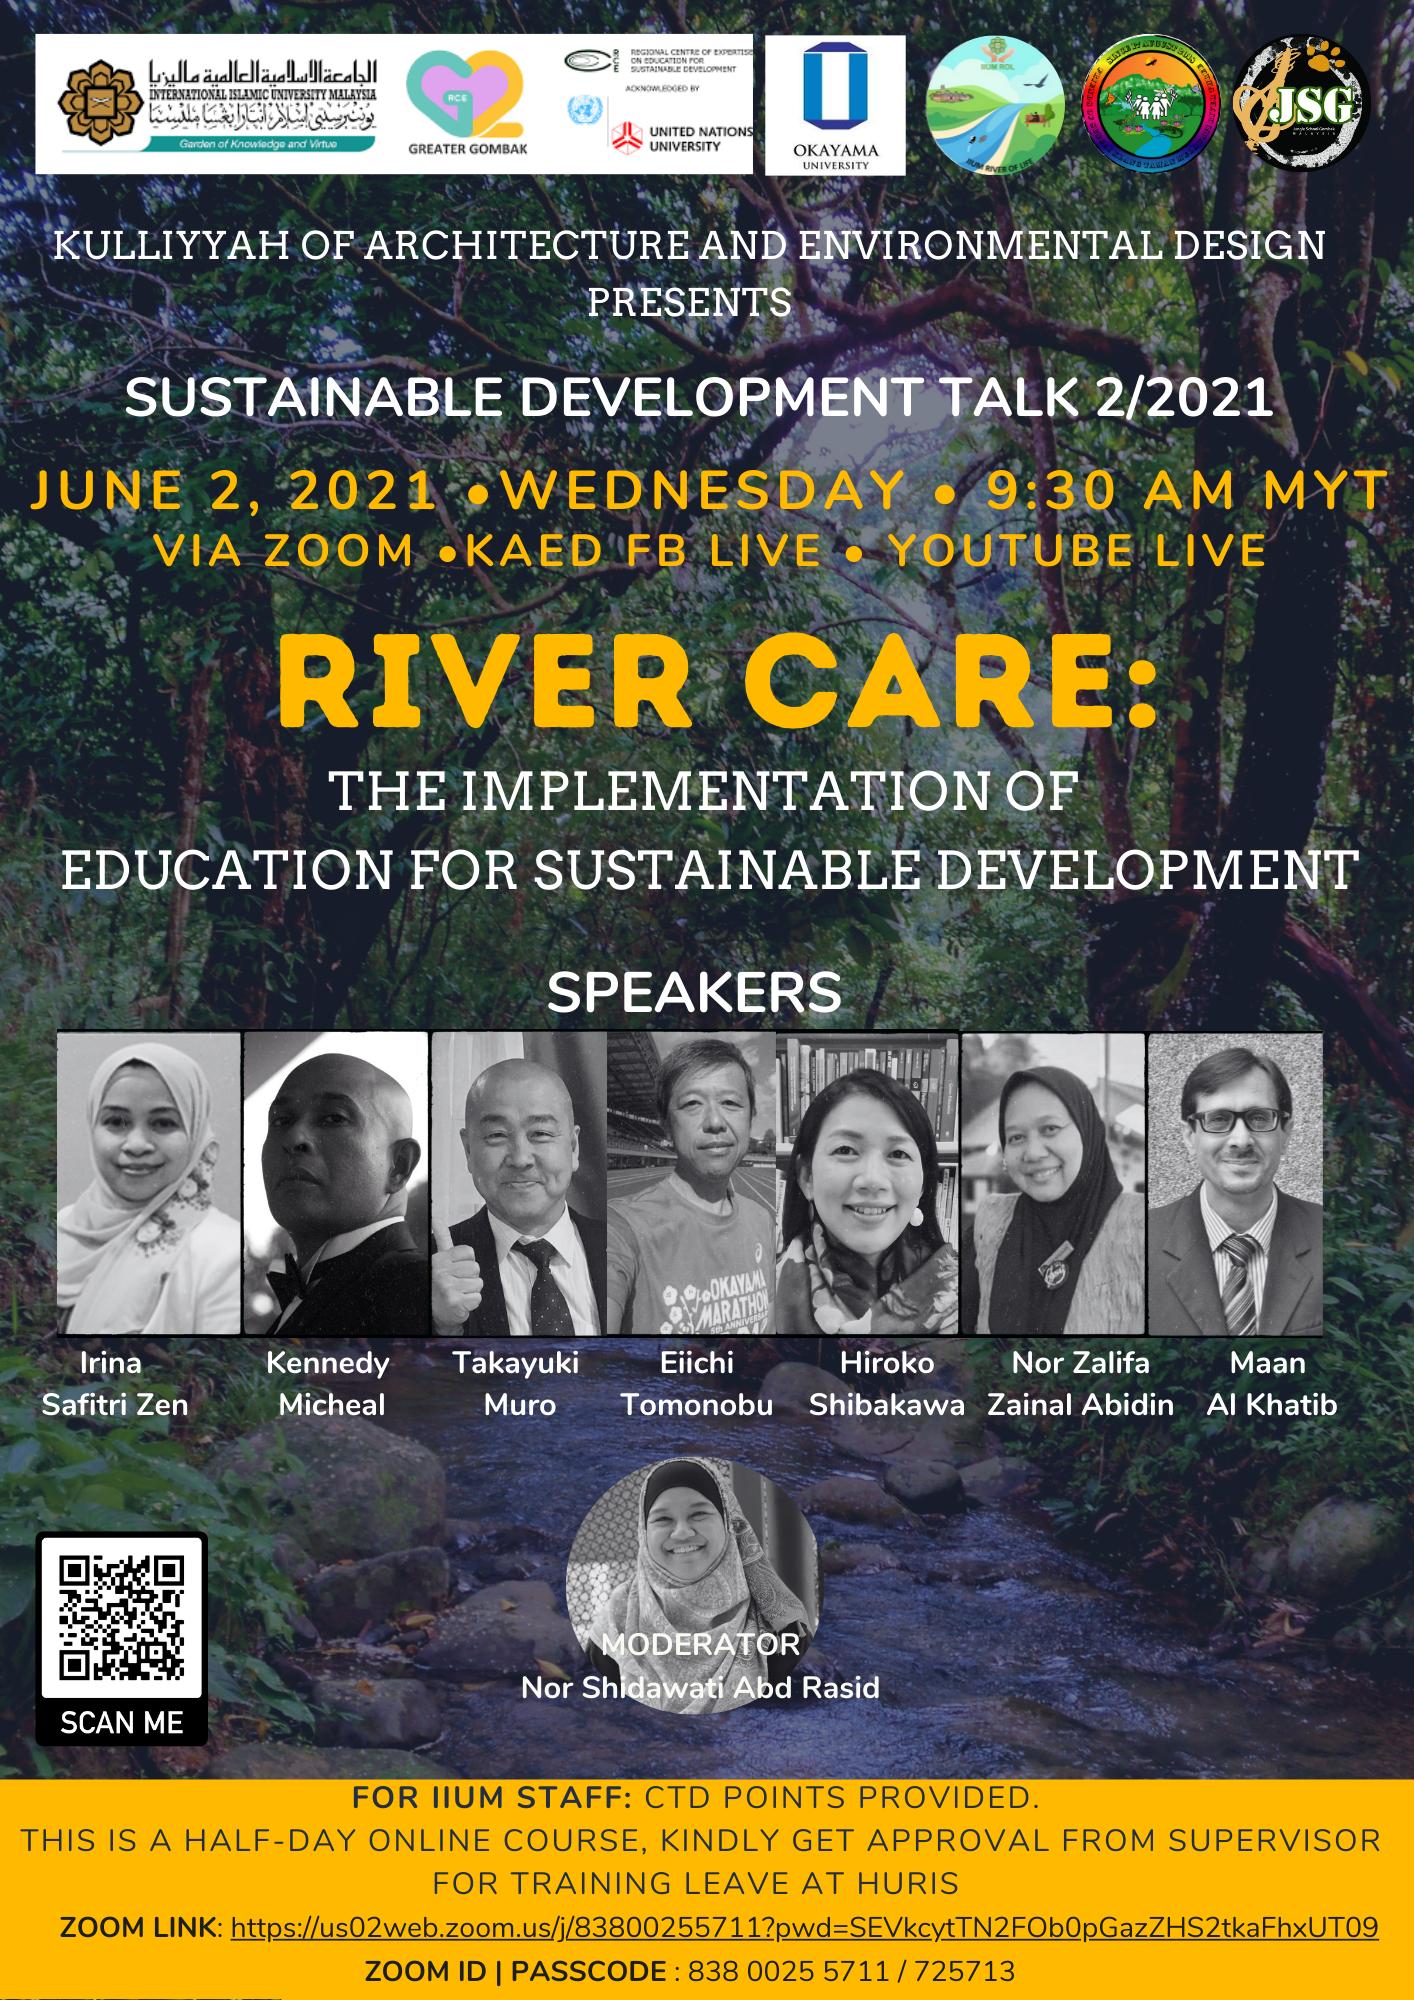 KAED Sustainable Development Talk 2/2021: River Care - The Implementation Education for Sustainable Development